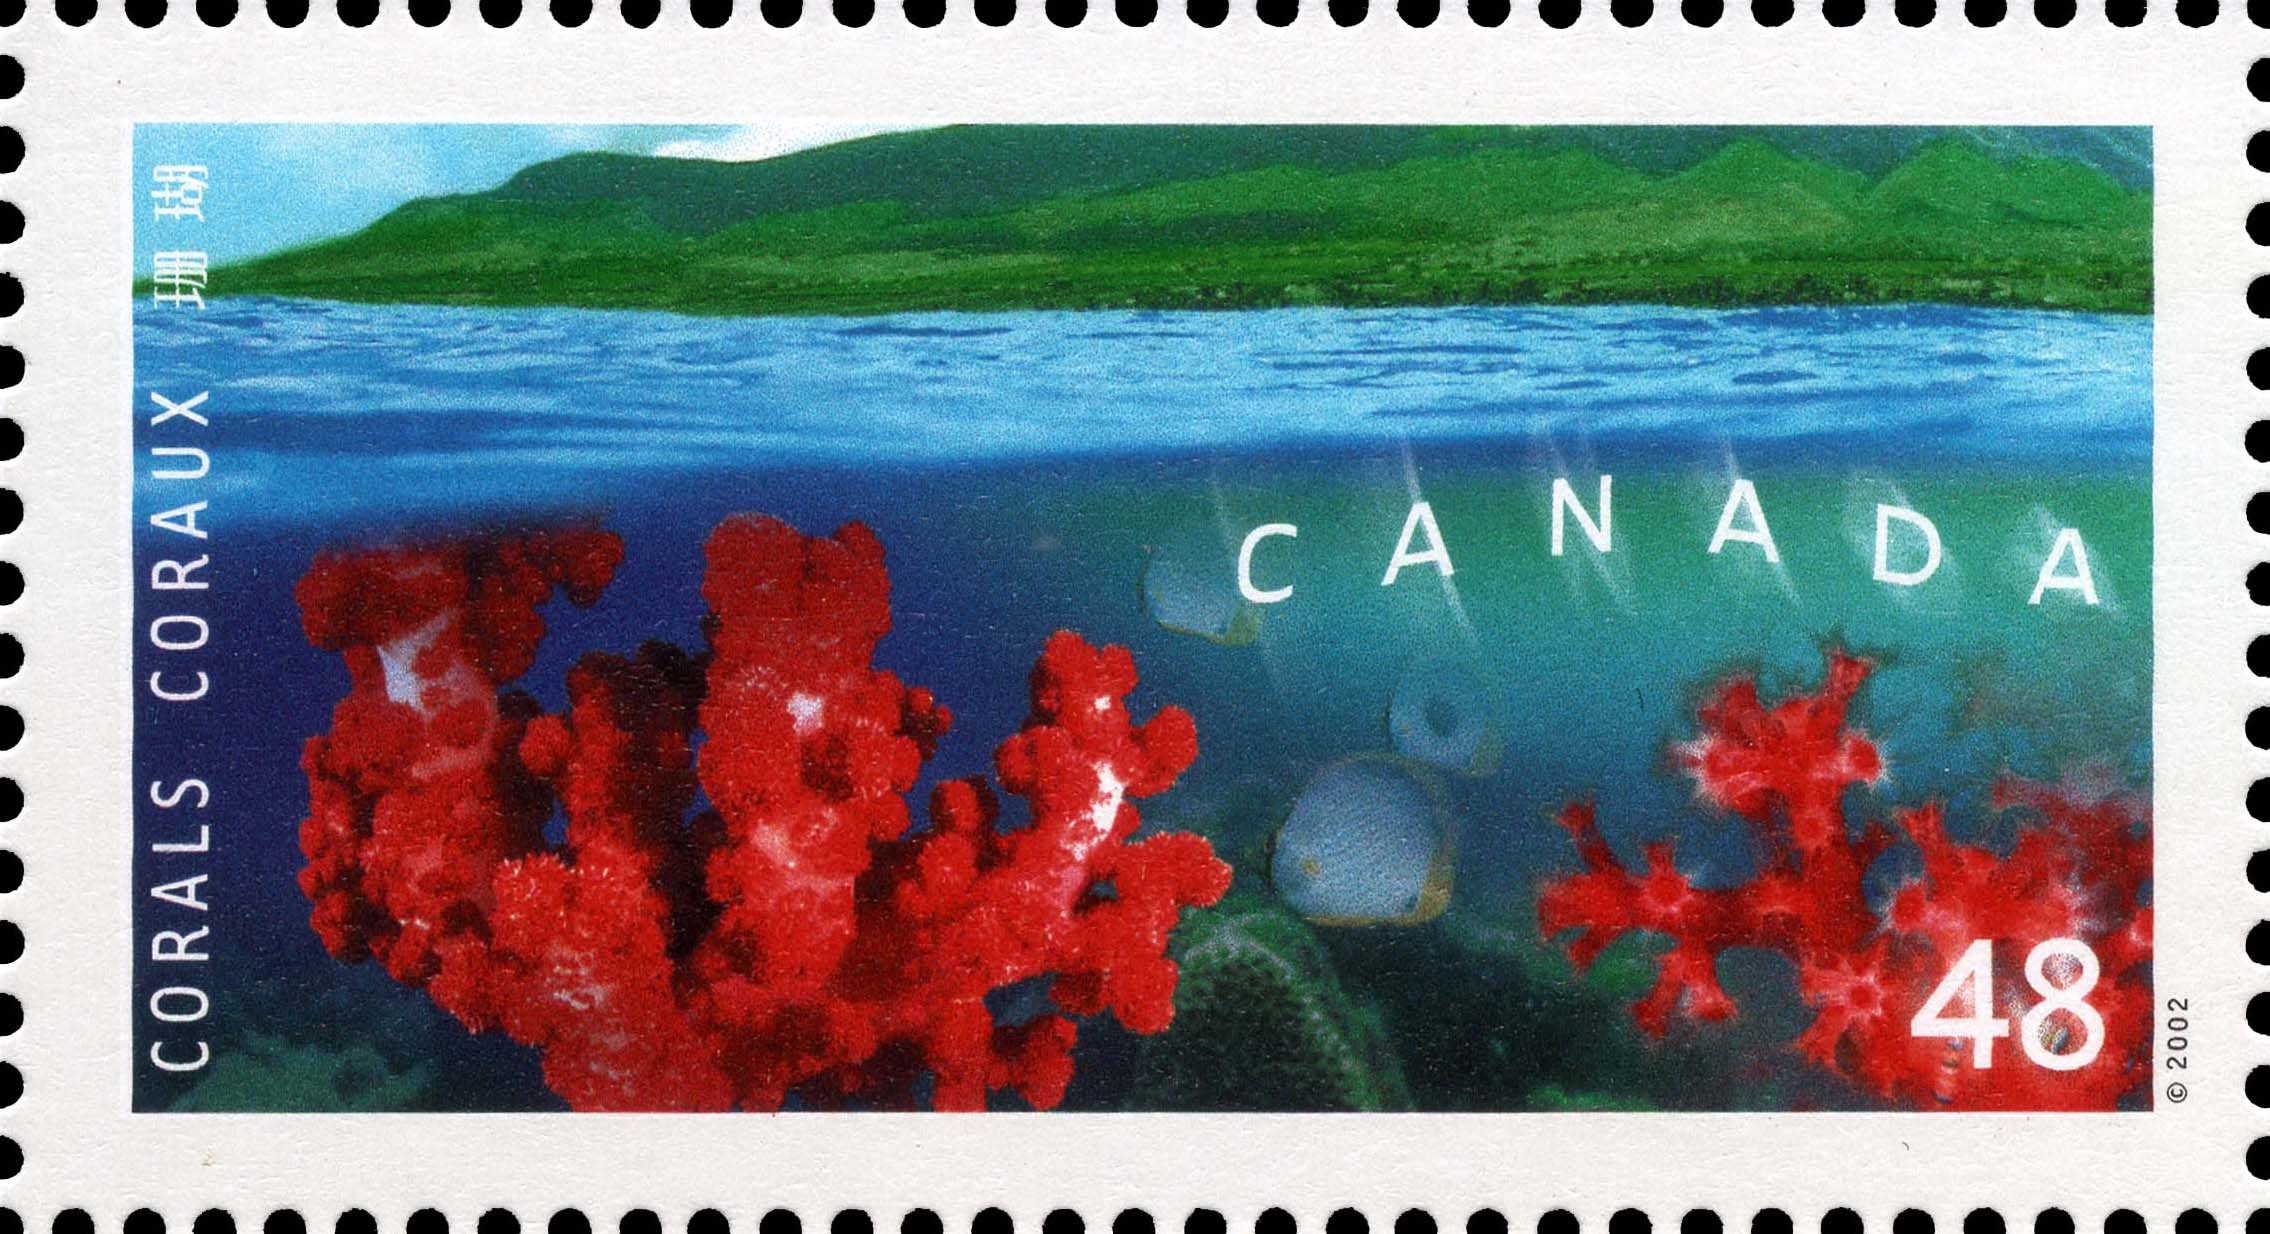 Dendronepthea gigantea and Dendronepthea Canada Postage Stamp